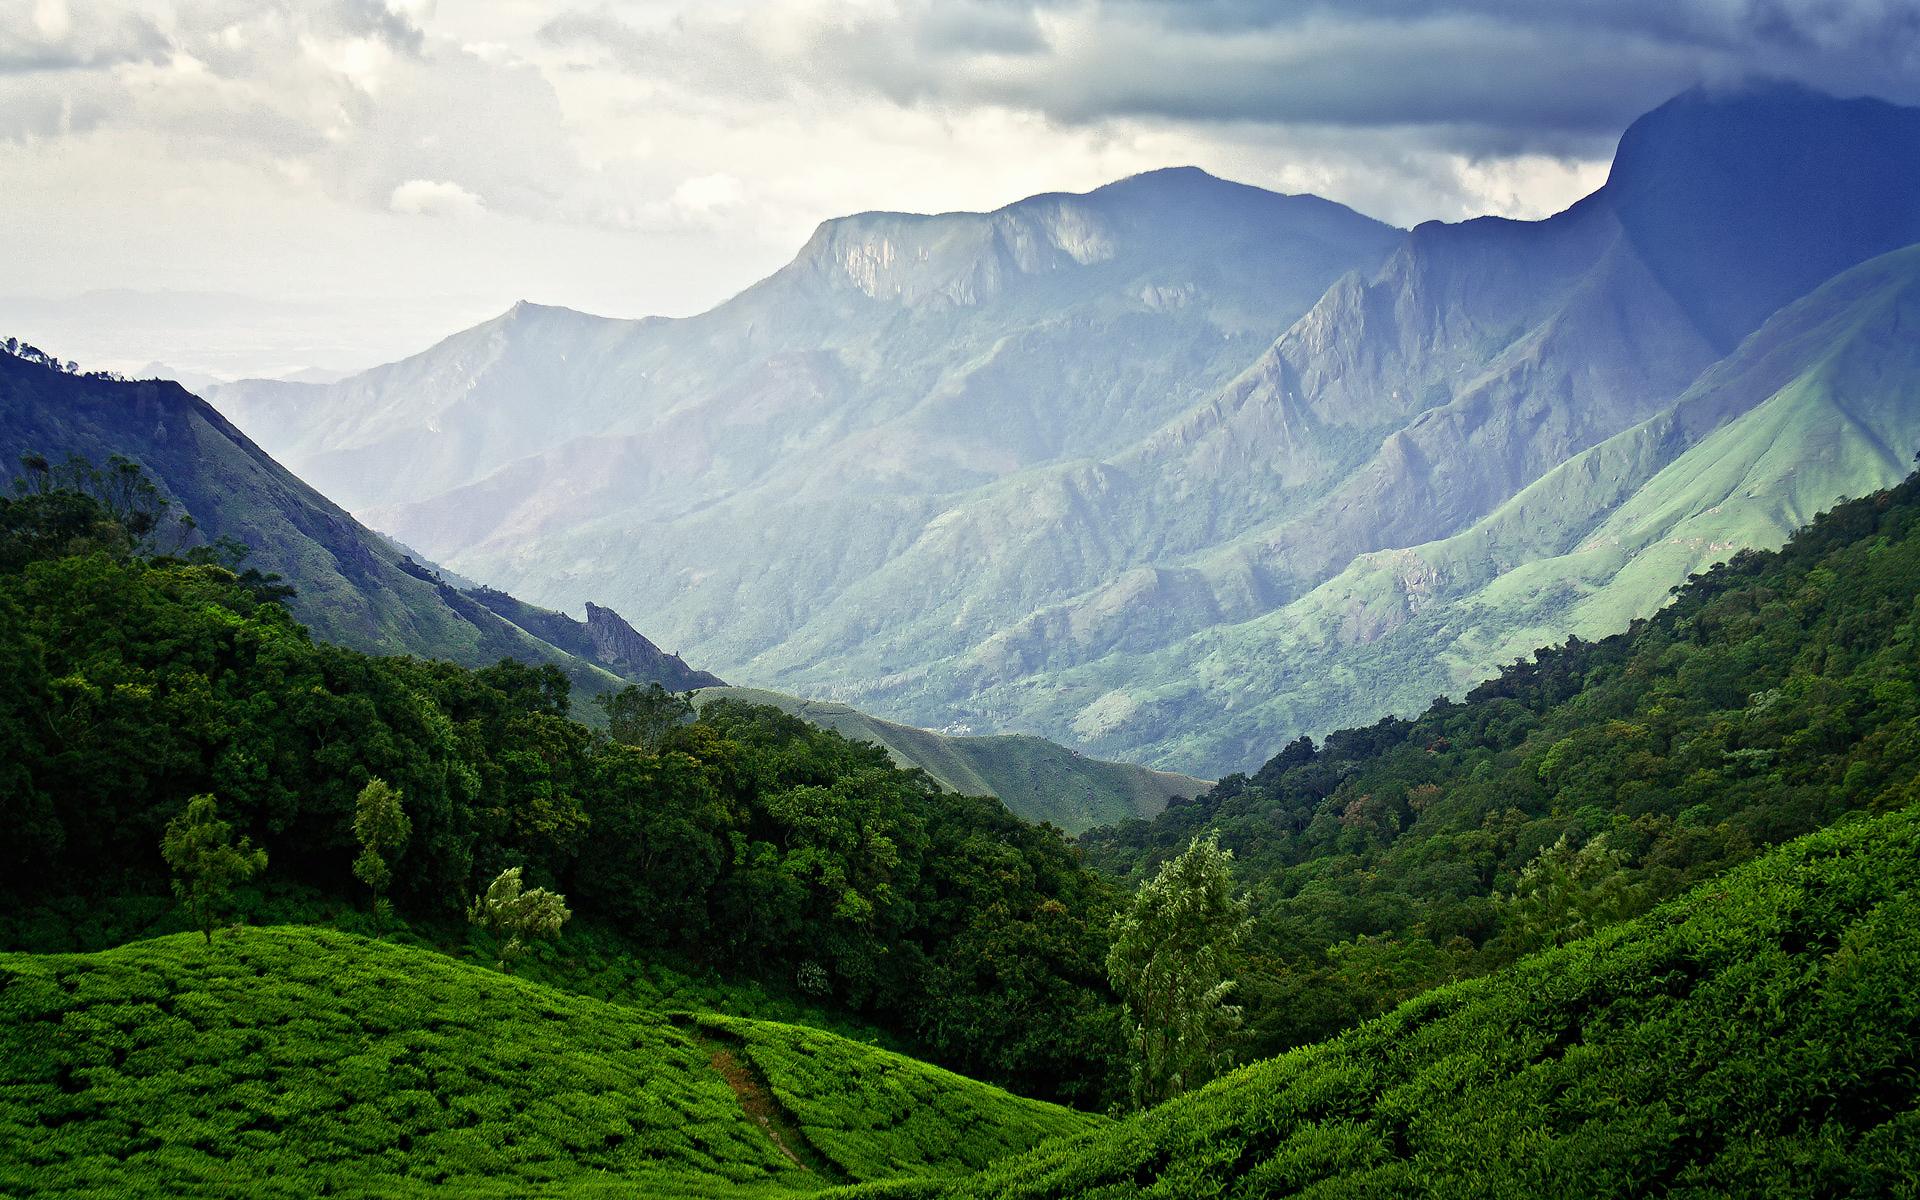 Картинки пейзажи индии